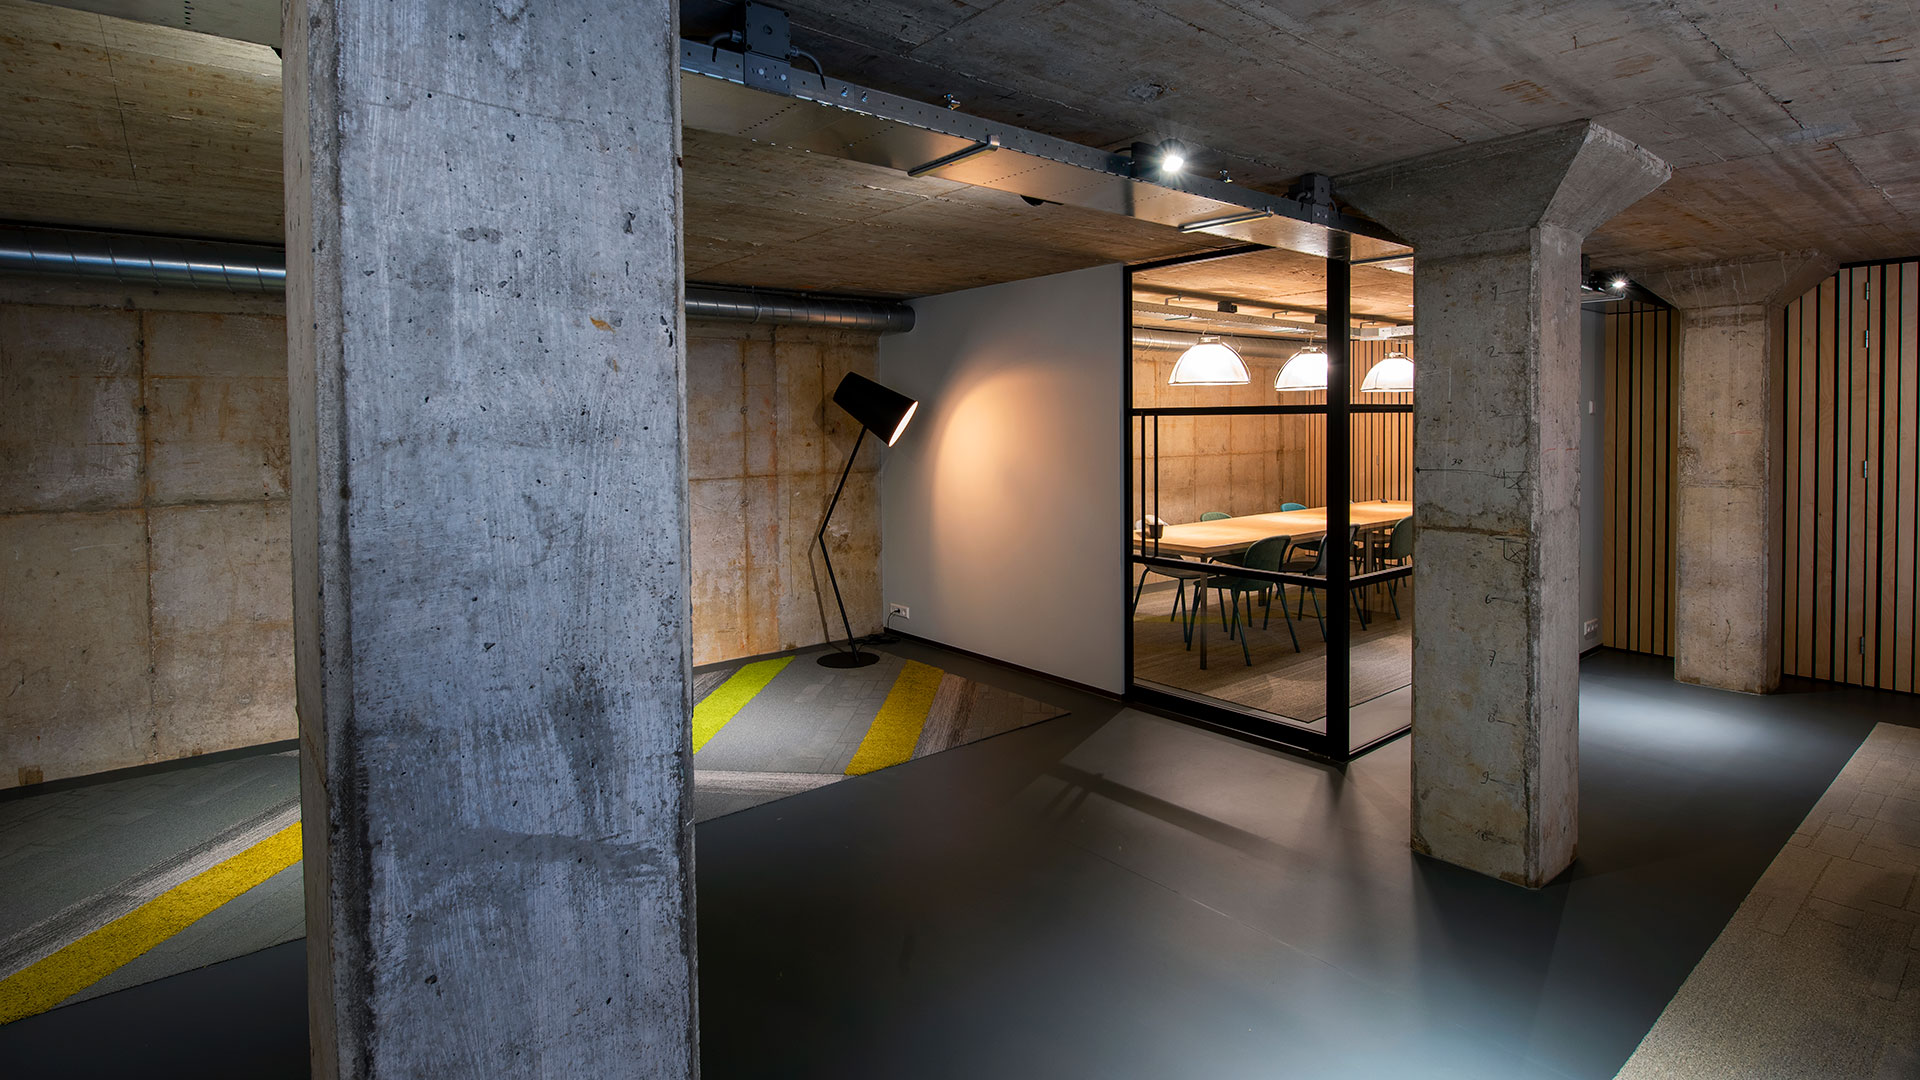 Arnhems-Buiten_B09_Weusten-Liedenbaum-Architecten_kelder